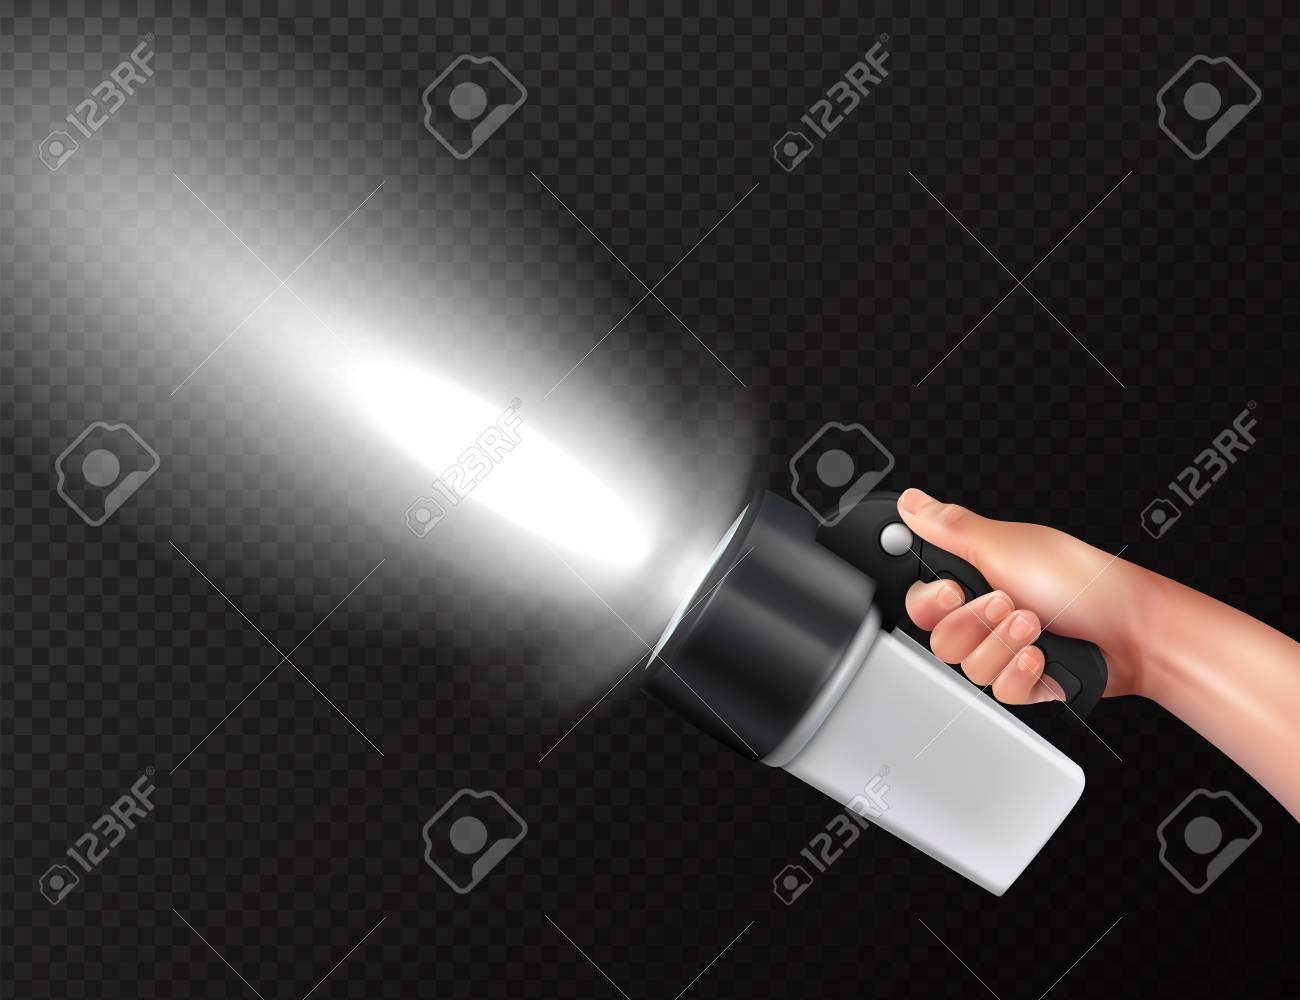 Modern powerful high lumen handheld torch flashlight in hand realistic composition against dark transparent background vector illustration - 113844632